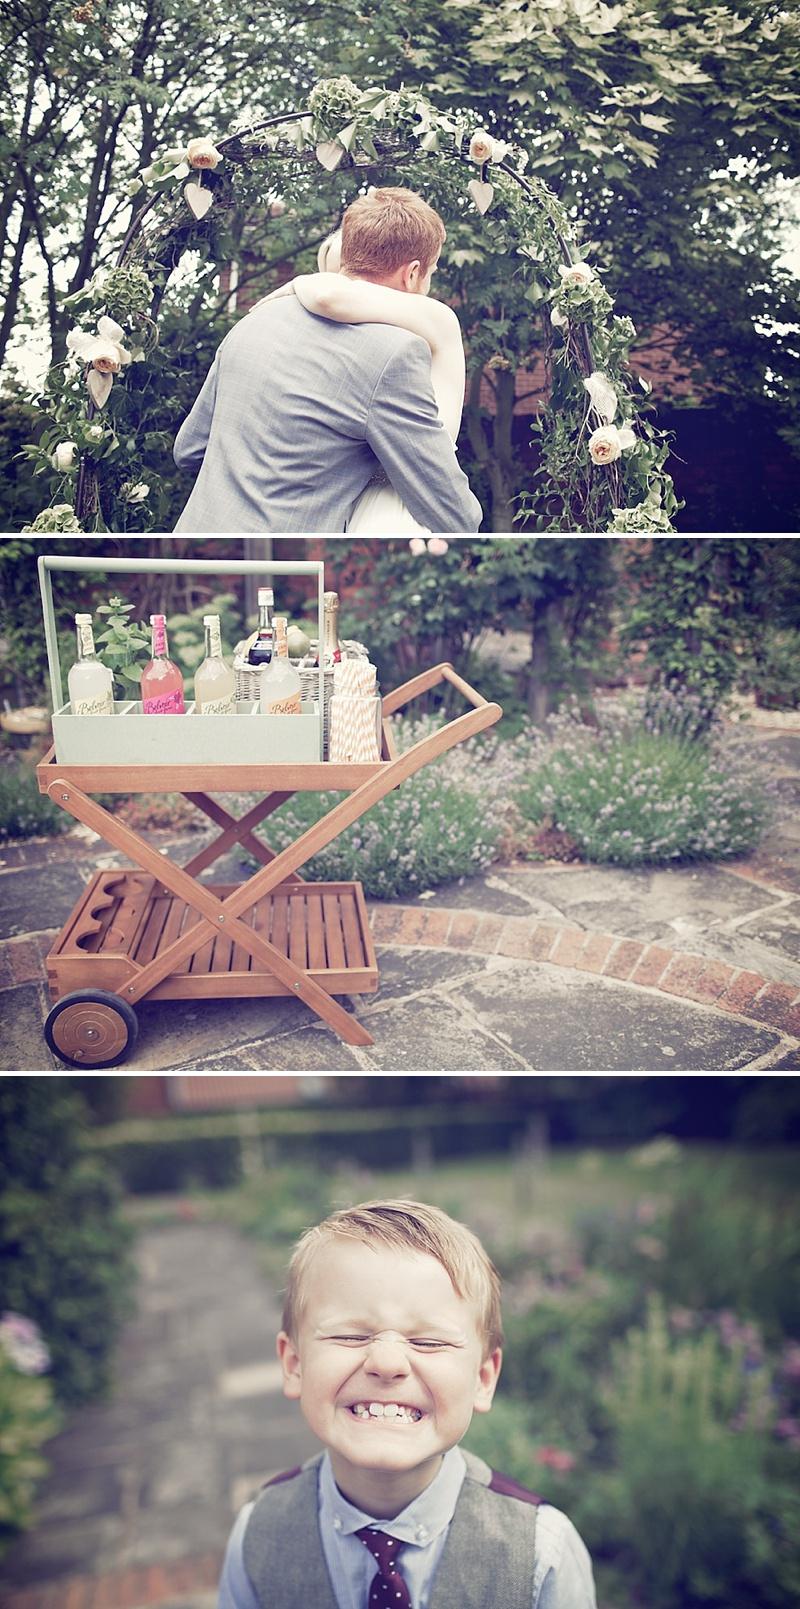 An english country backgarden humanist wedding with Biba dress tipi reception_0010